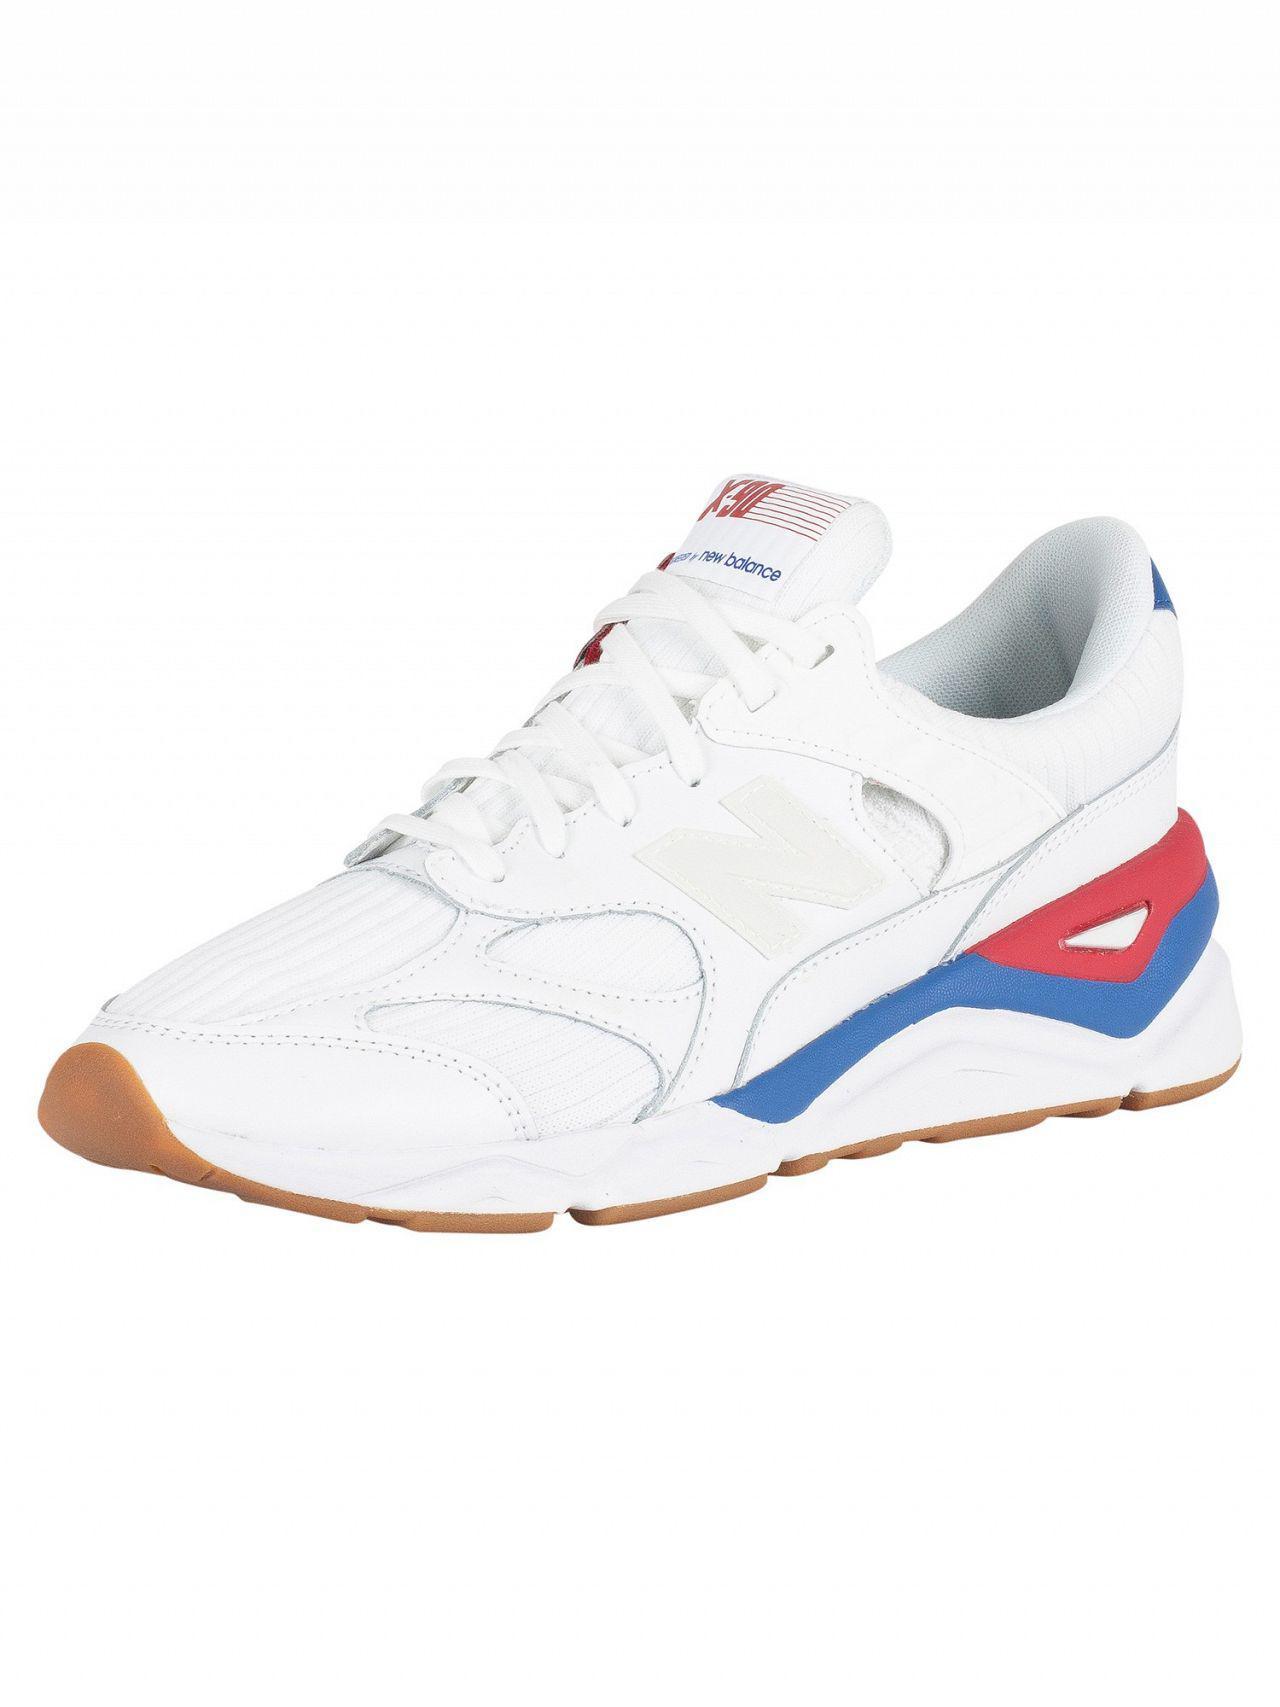 05621559b76db new-balance-white-Whitebluered-X-90-Trainers.jpeg